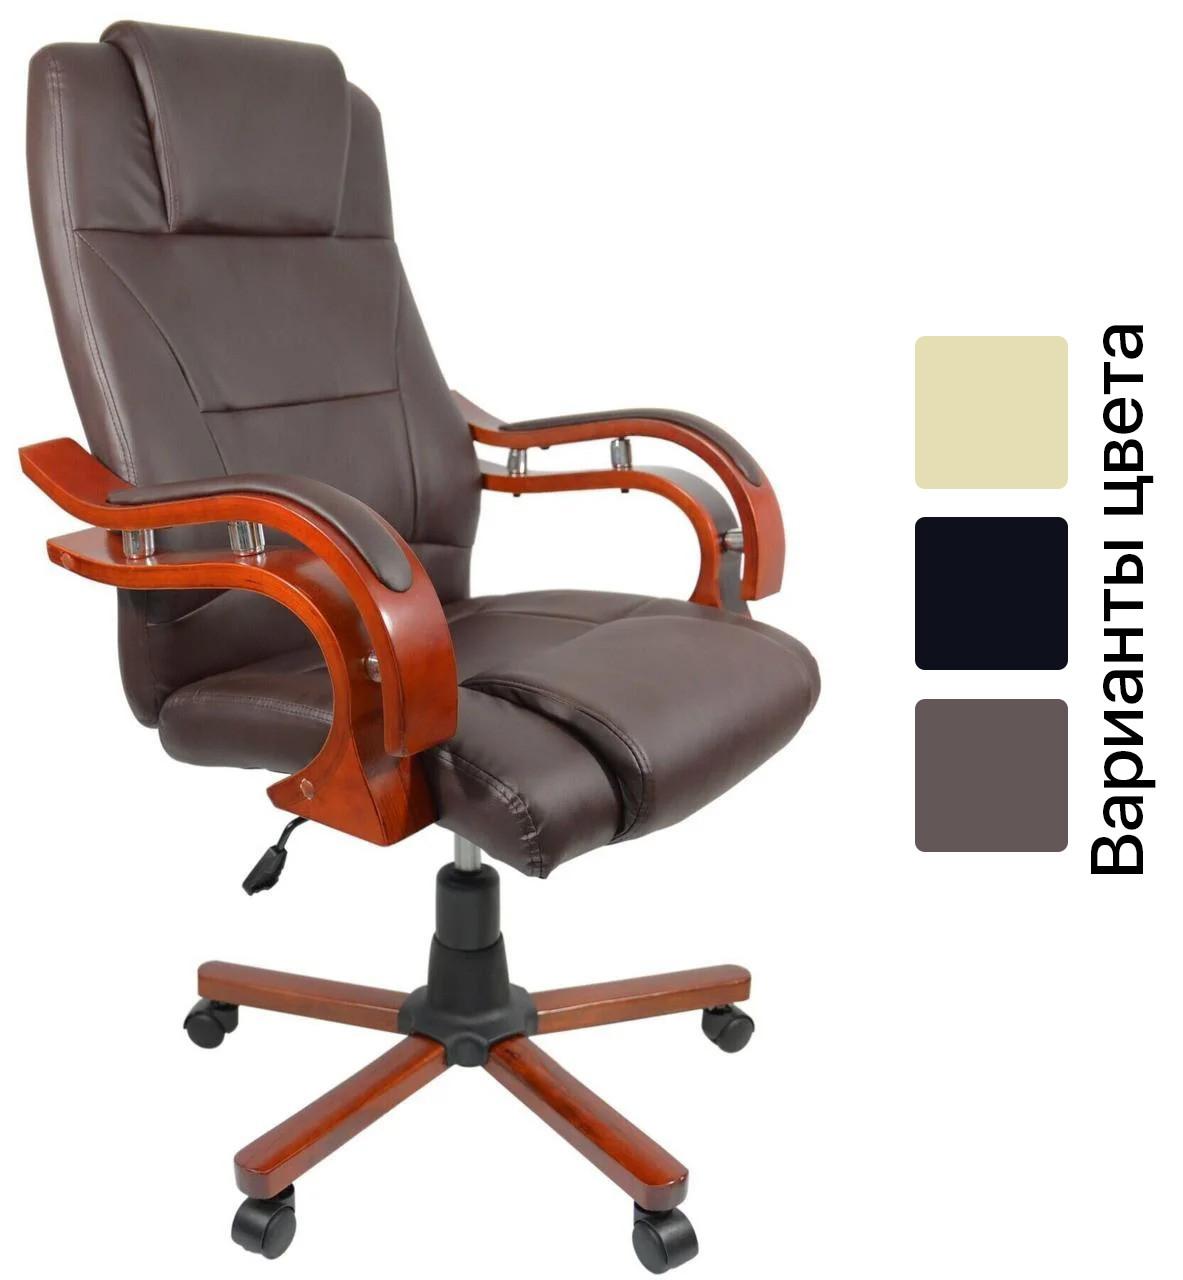 Офисное компьютерное кресло Prezydent Calviano (офісне комп'ютерне крісло для офиса дома)